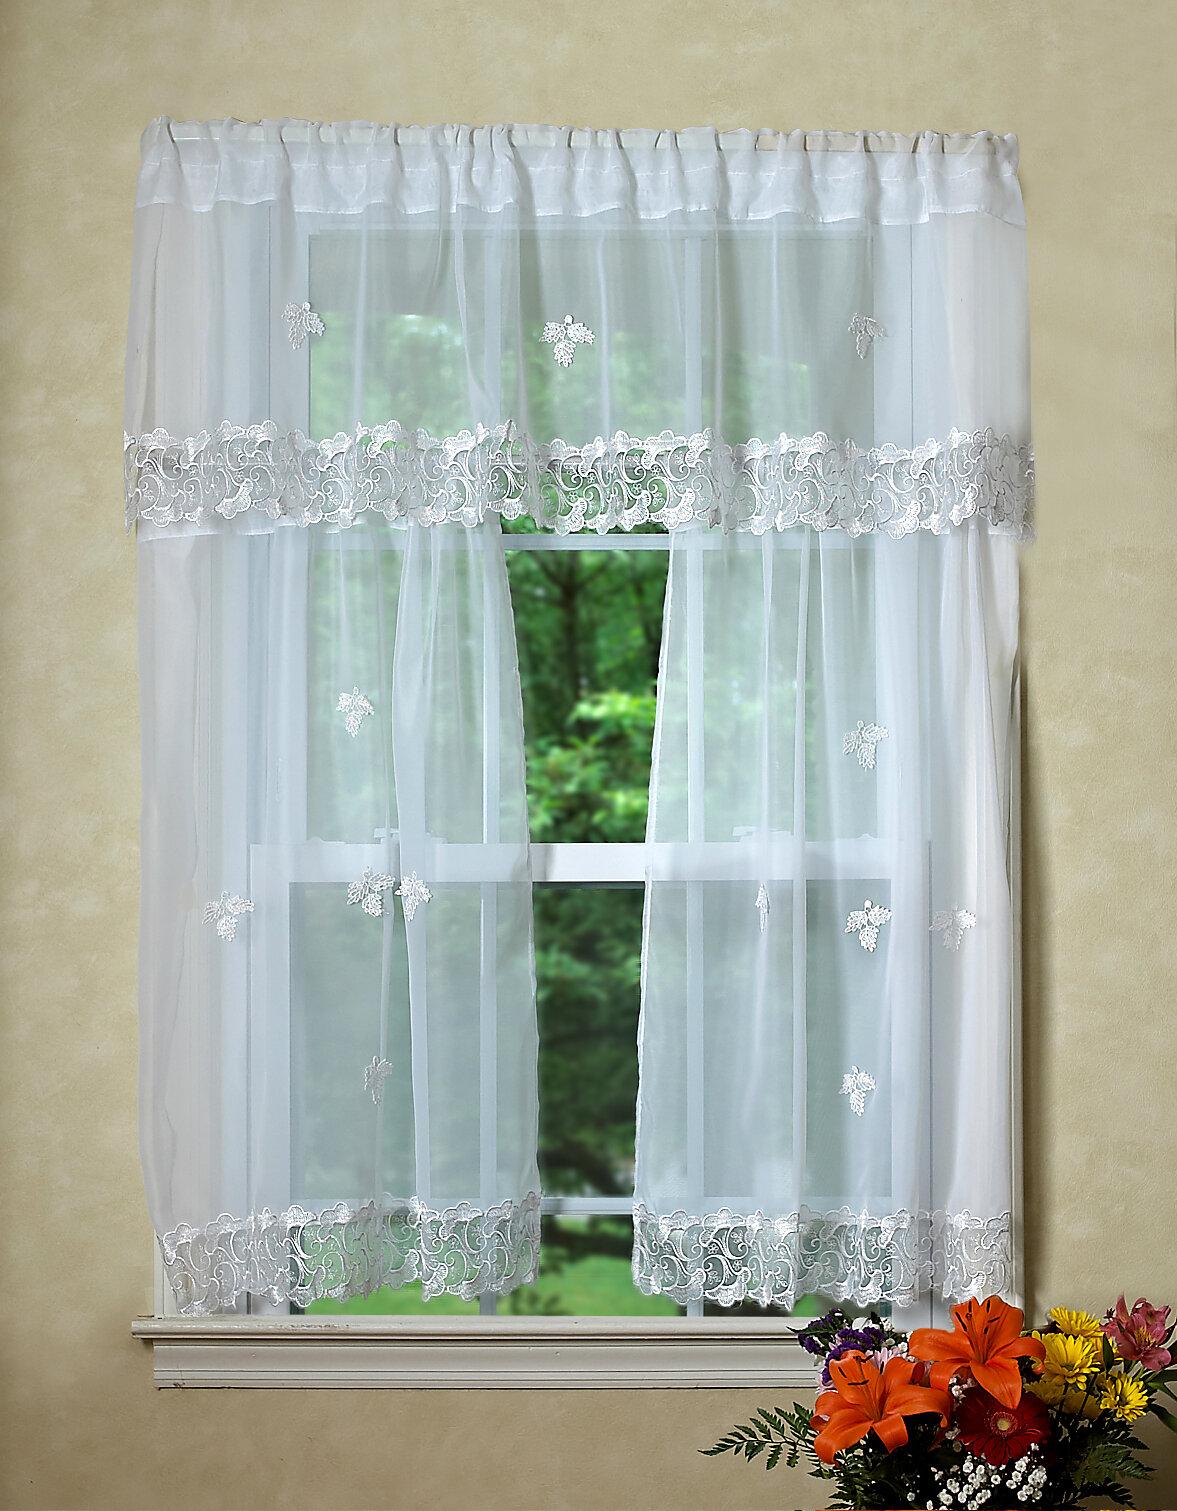 Violet Linen Lima Sheer Kitchen Curtain Valance and Tier Set ...